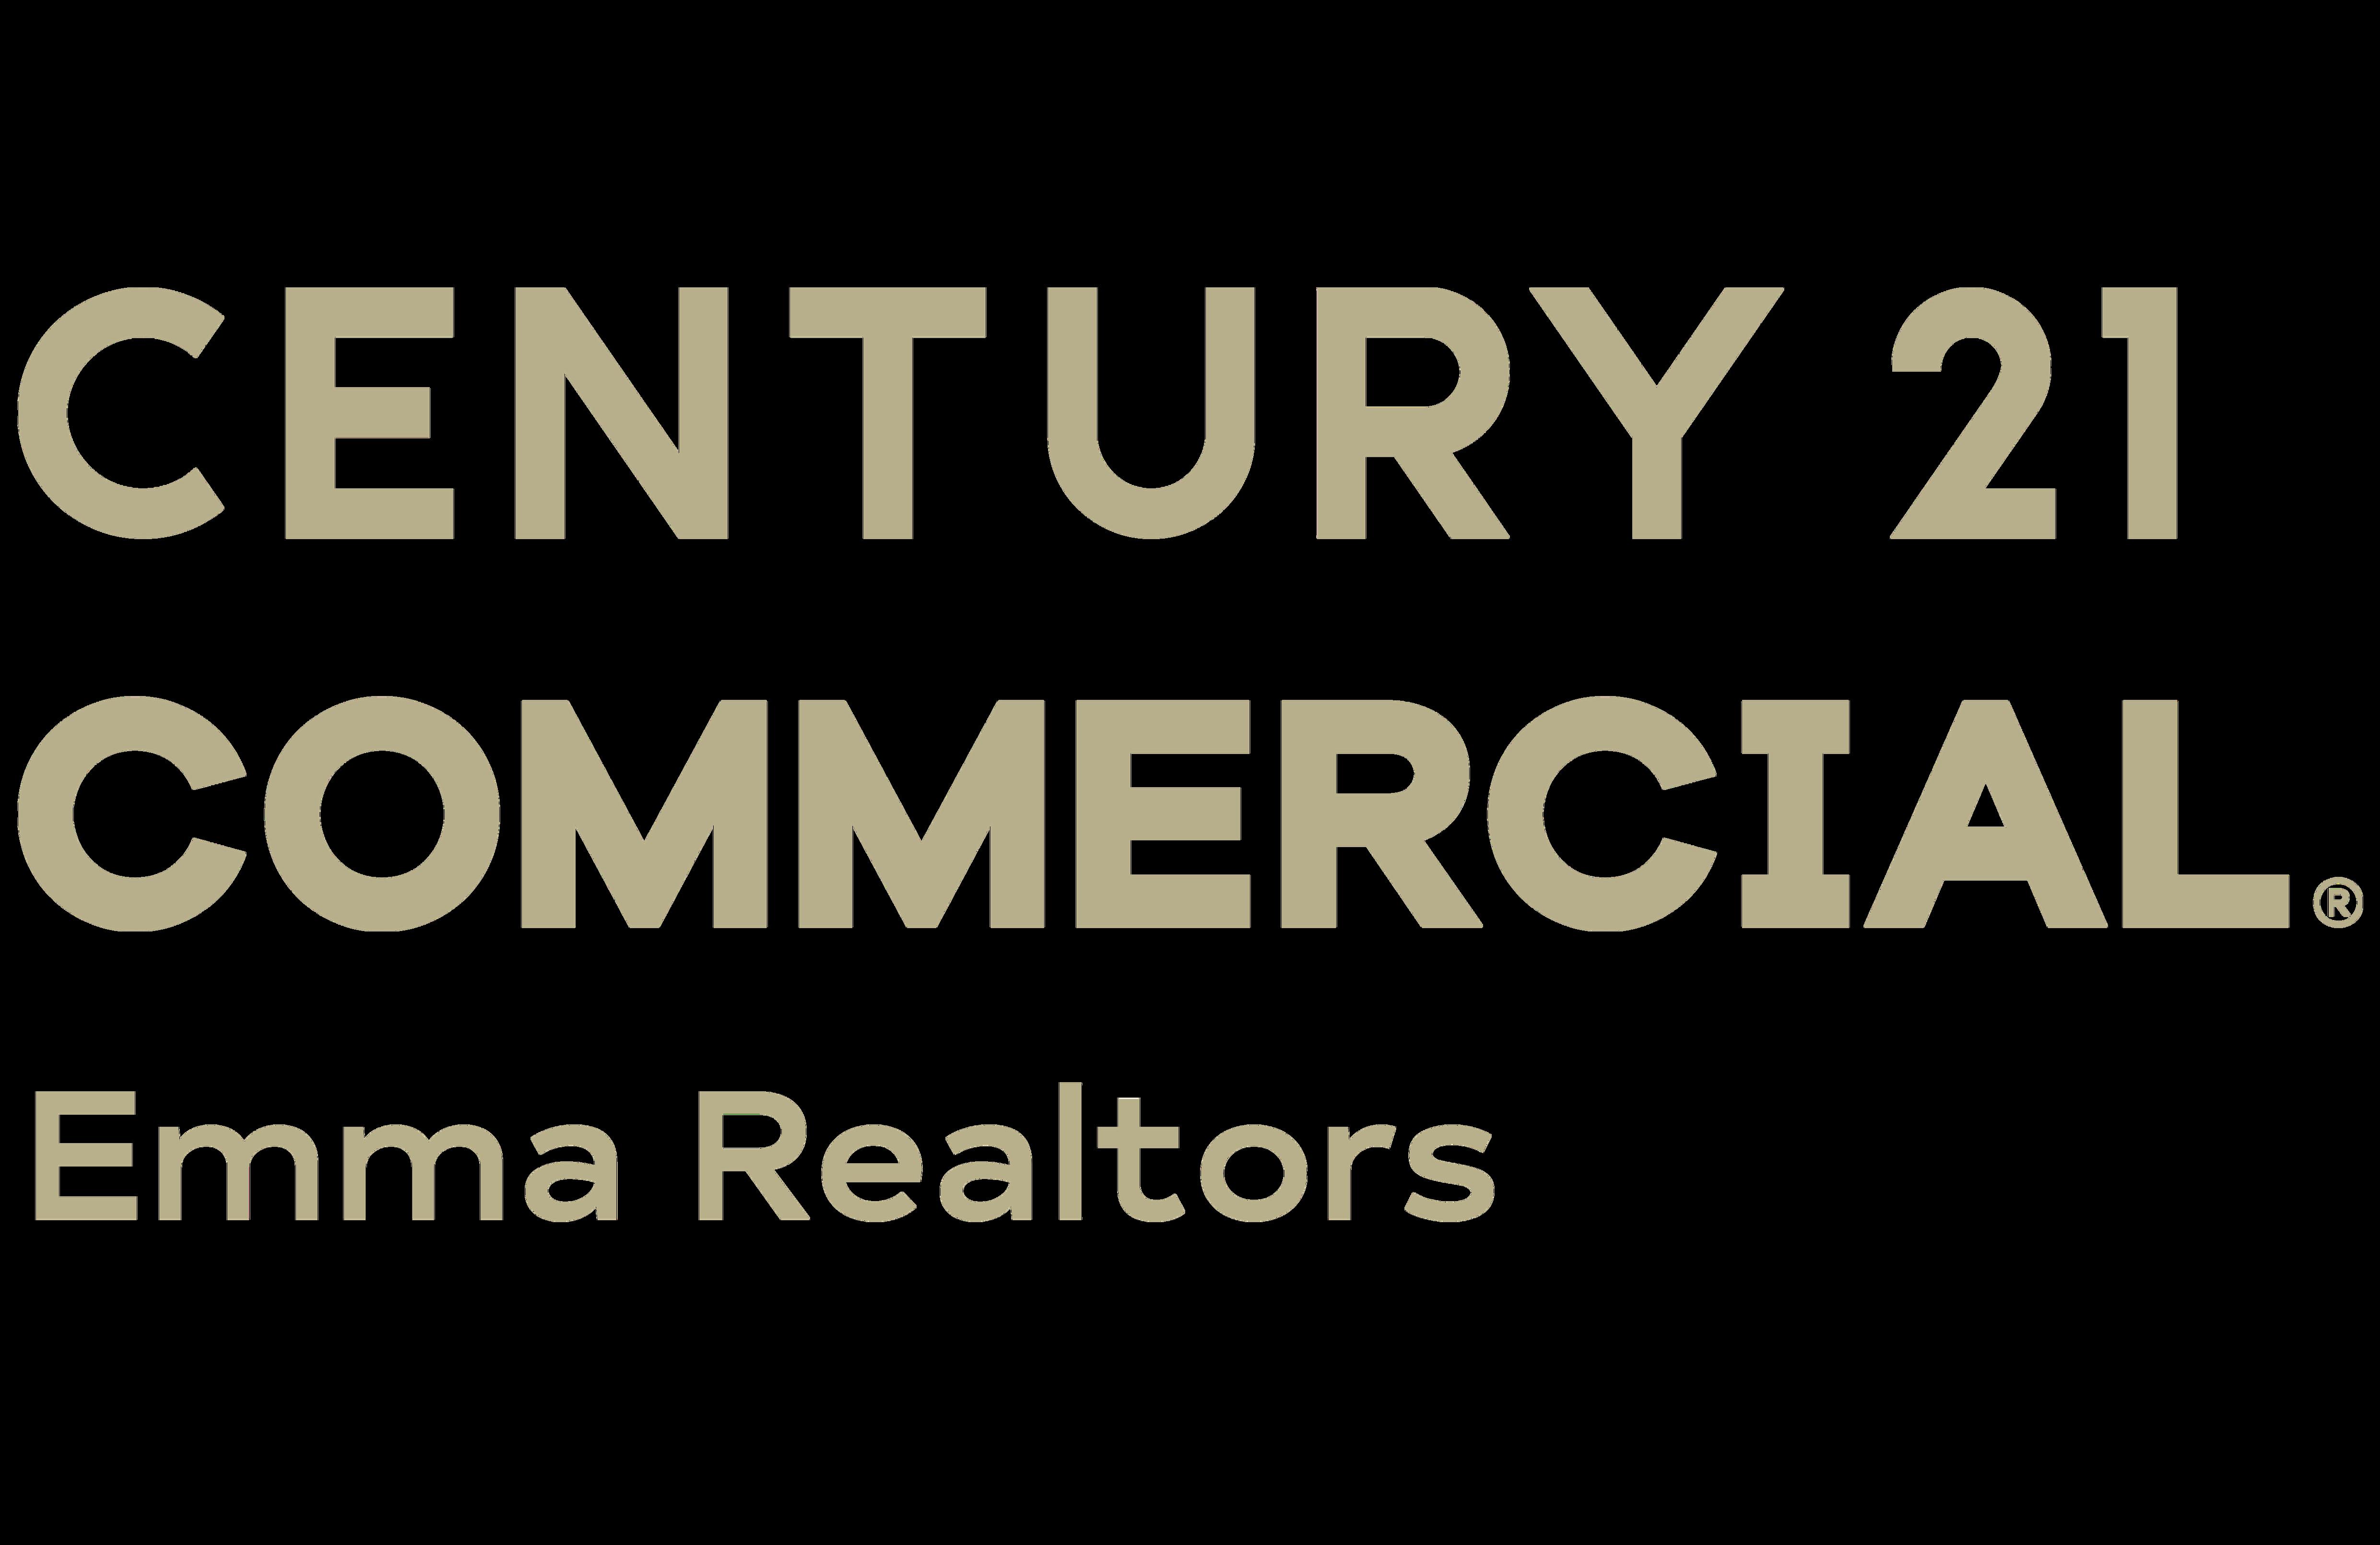 Joseph R. Emma of CENTURY 21 Emma Realtors logo